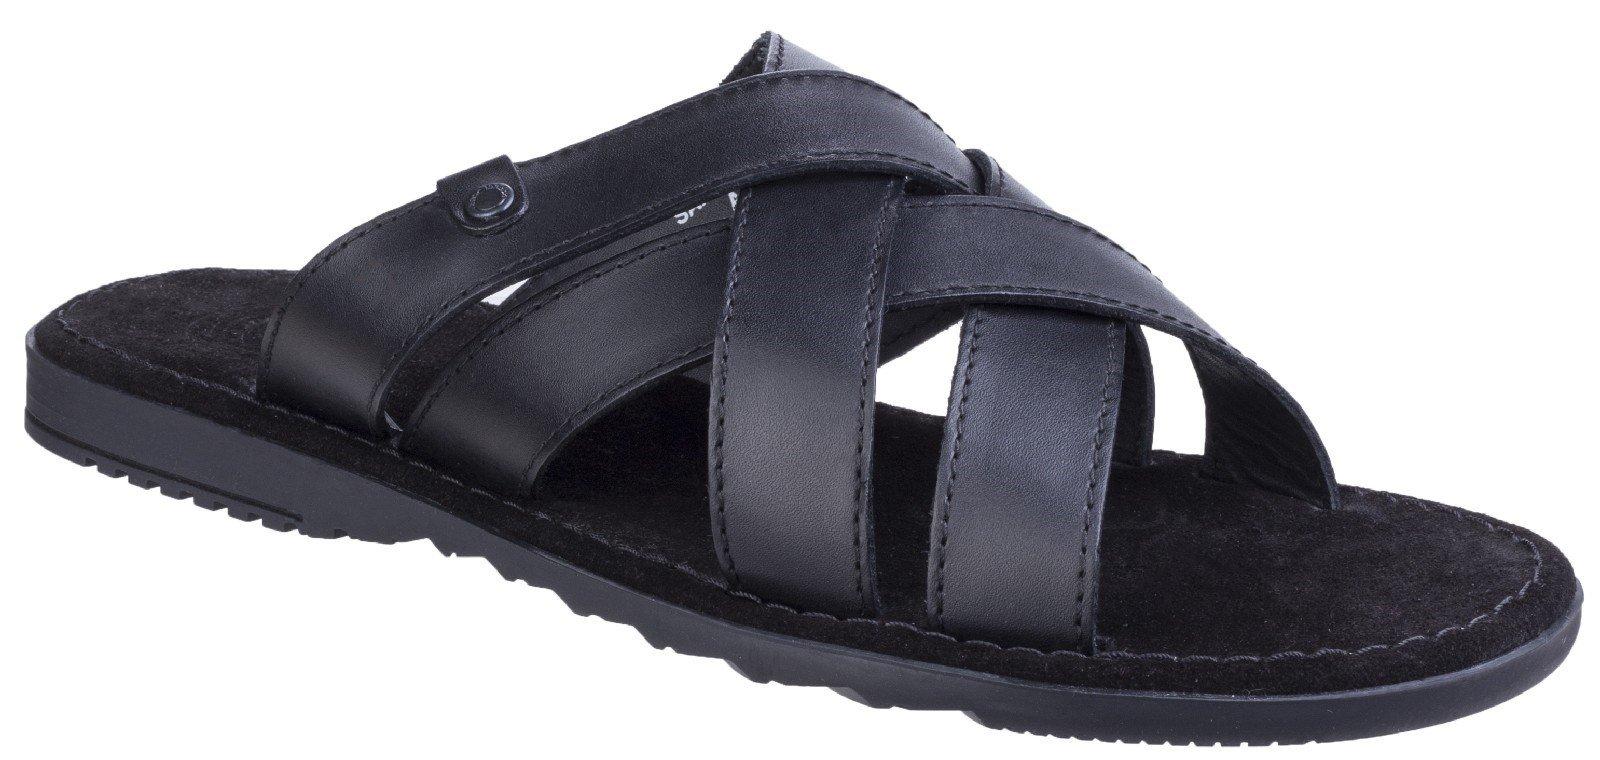 Base London Men's Apollo Waxy Leather Flip Flop Black 25152 - Black 6